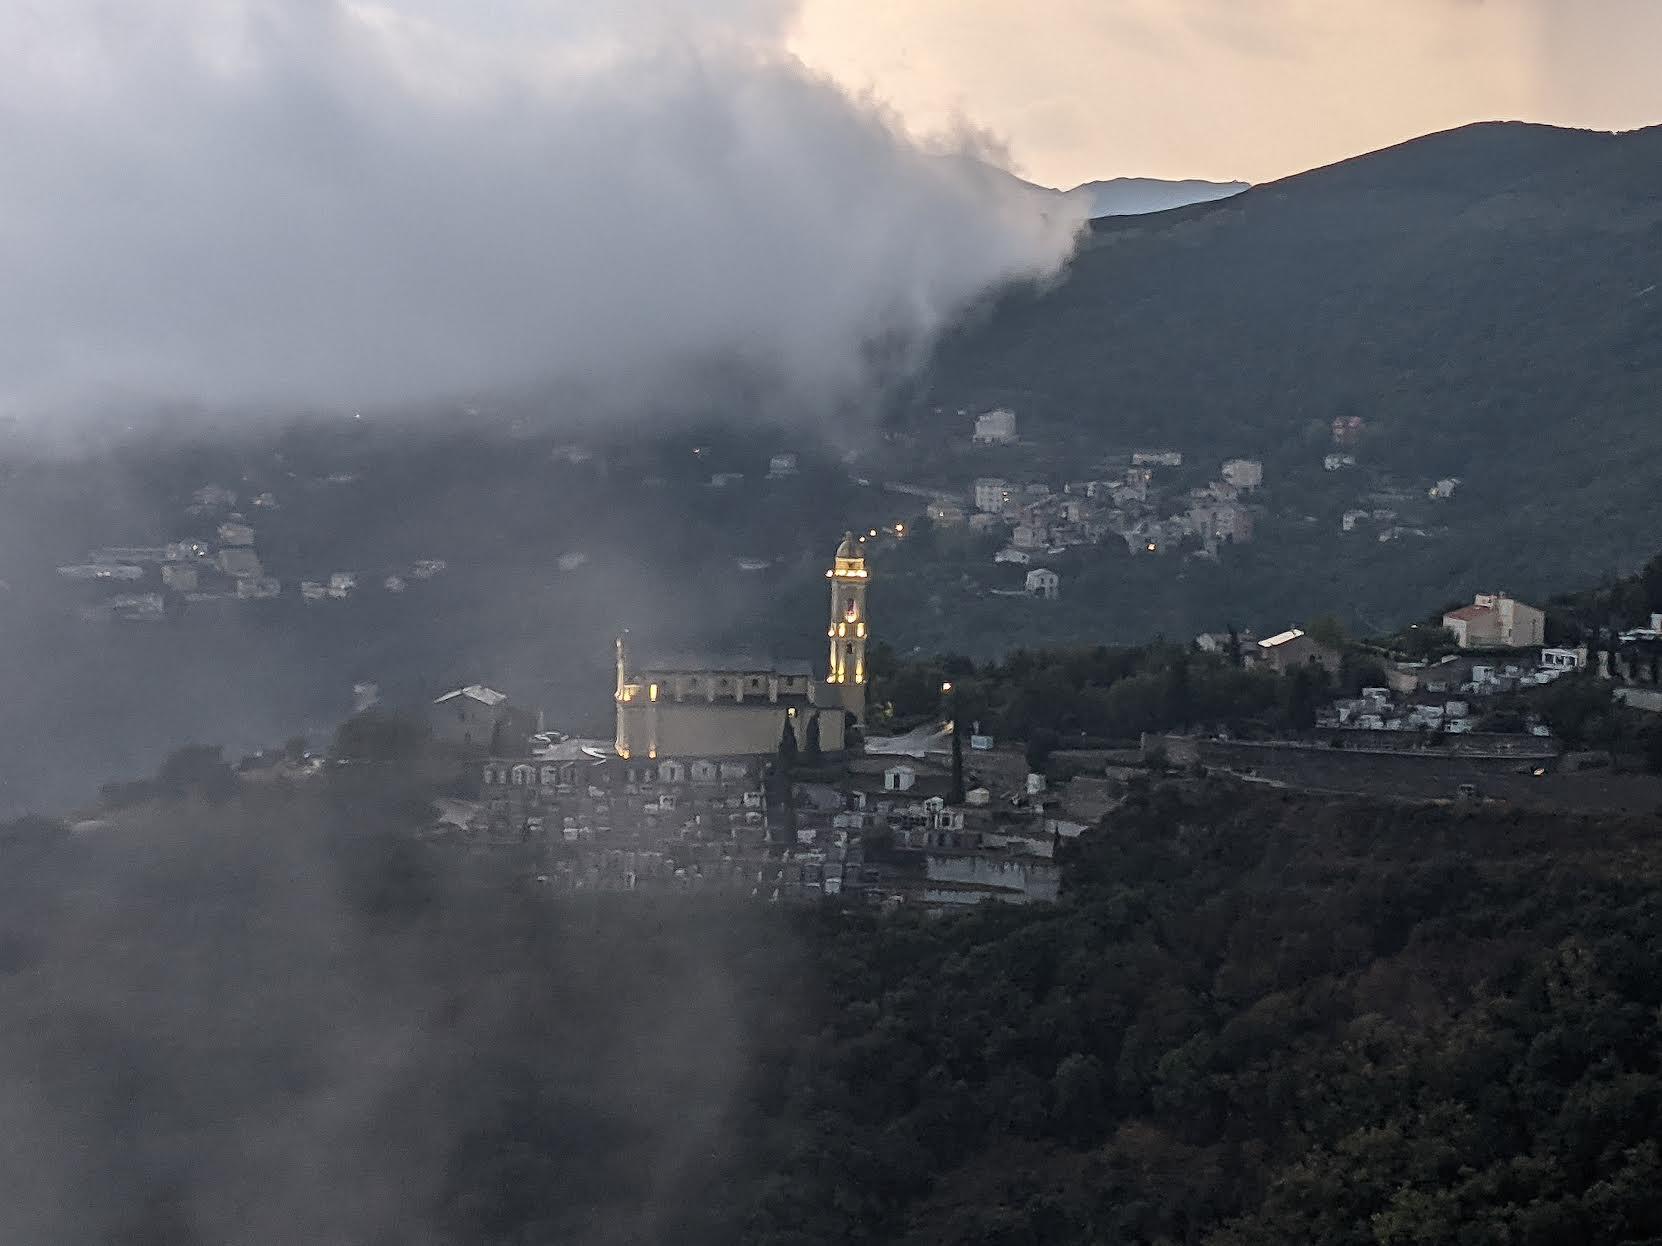 Ville-di-Pietrabugno (Hyacinthe Sambroni )